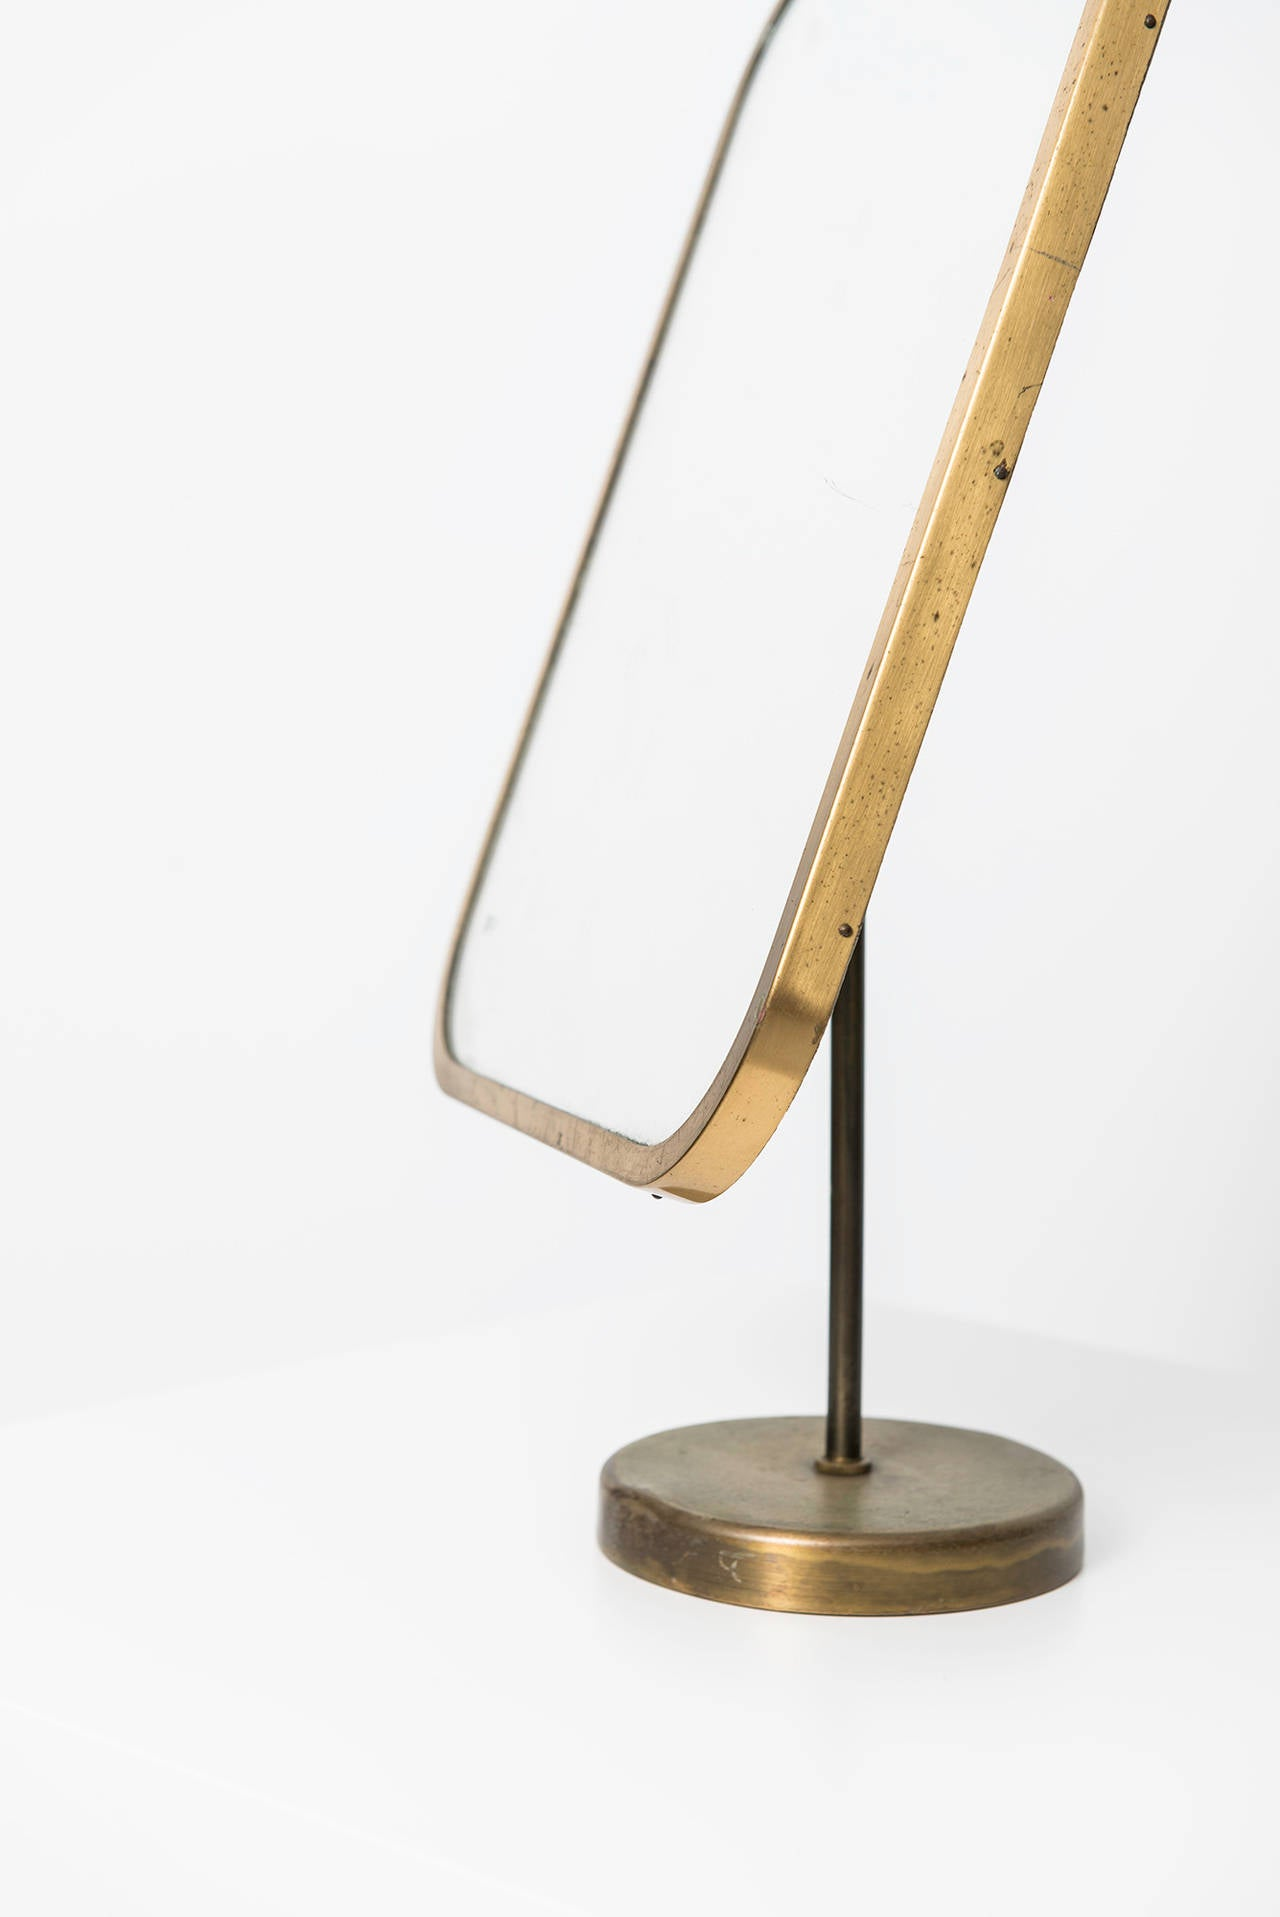 Rare table mirror in brass designed by Josef Frank. Produced by Nordiska Kompaniet in Sweden.